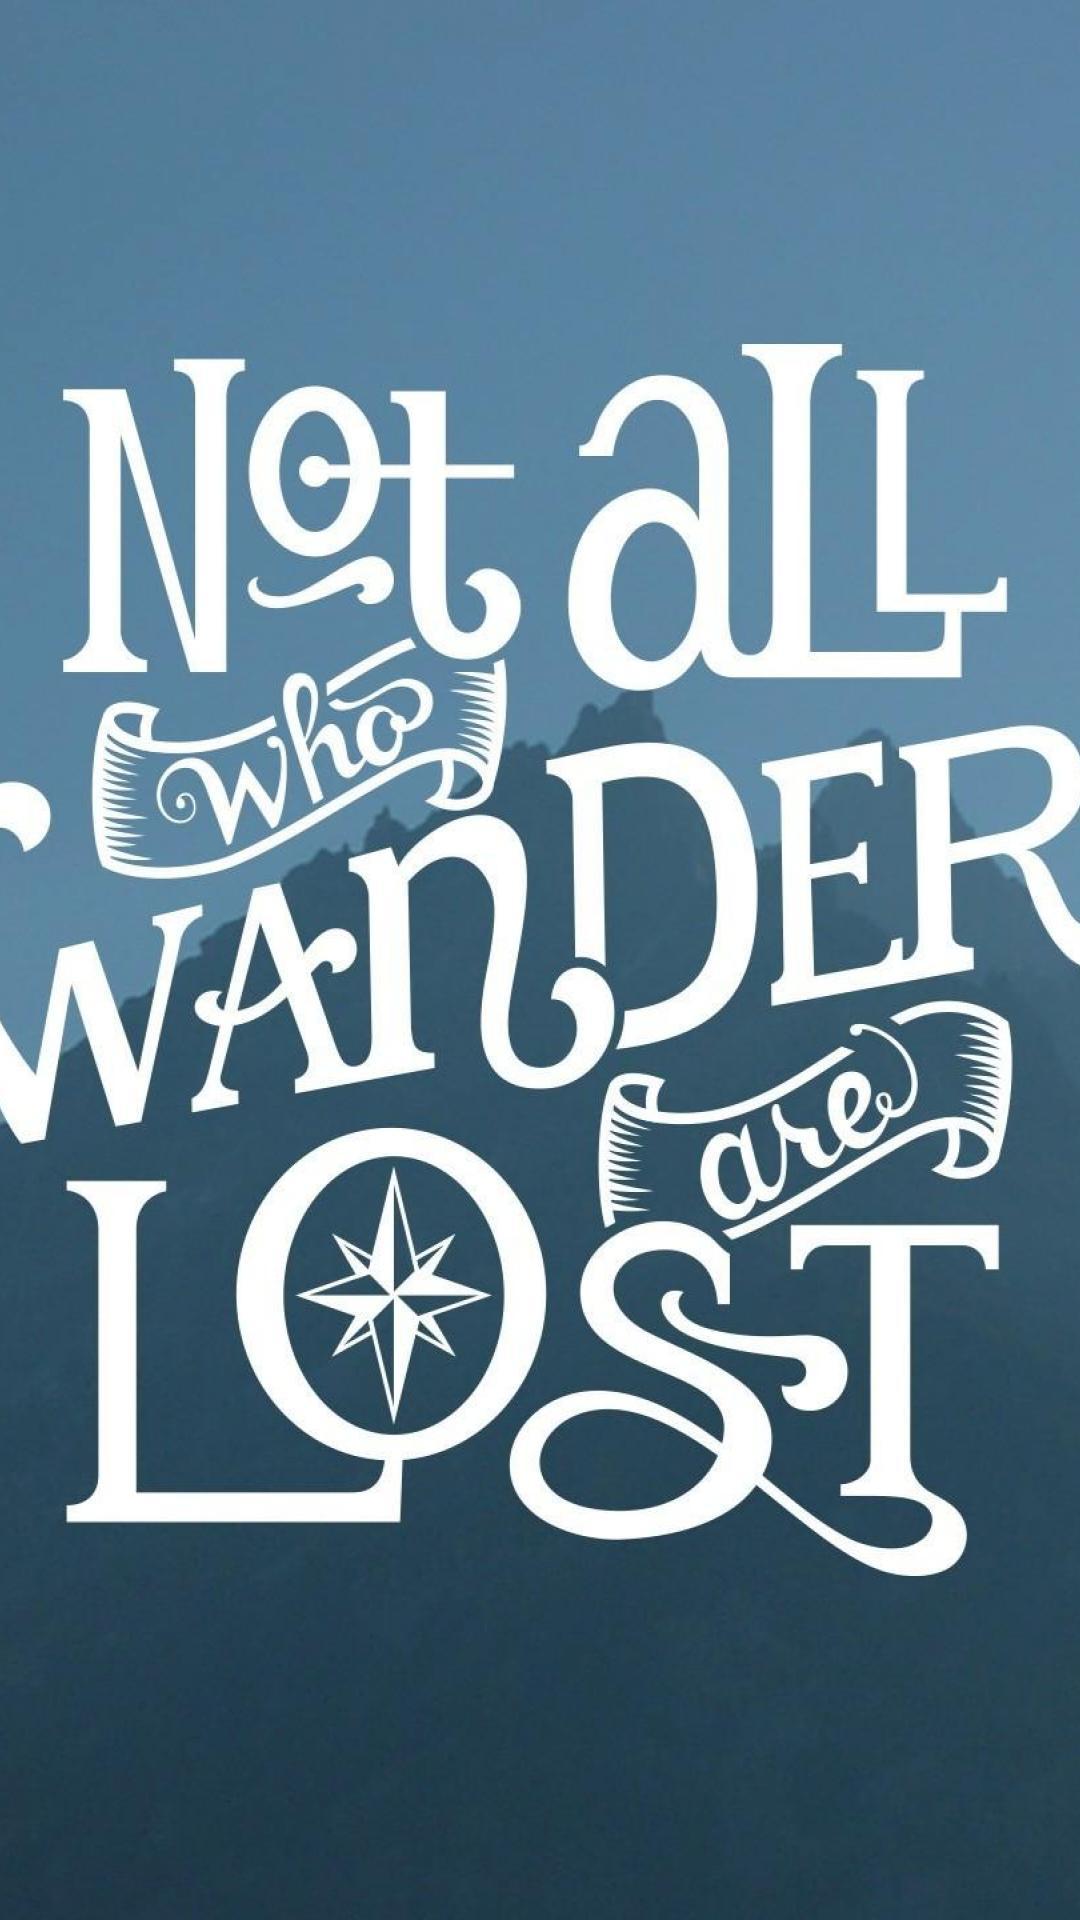 Wallpaper Wednesday Inspirational Quotes Sammobile Sammobile